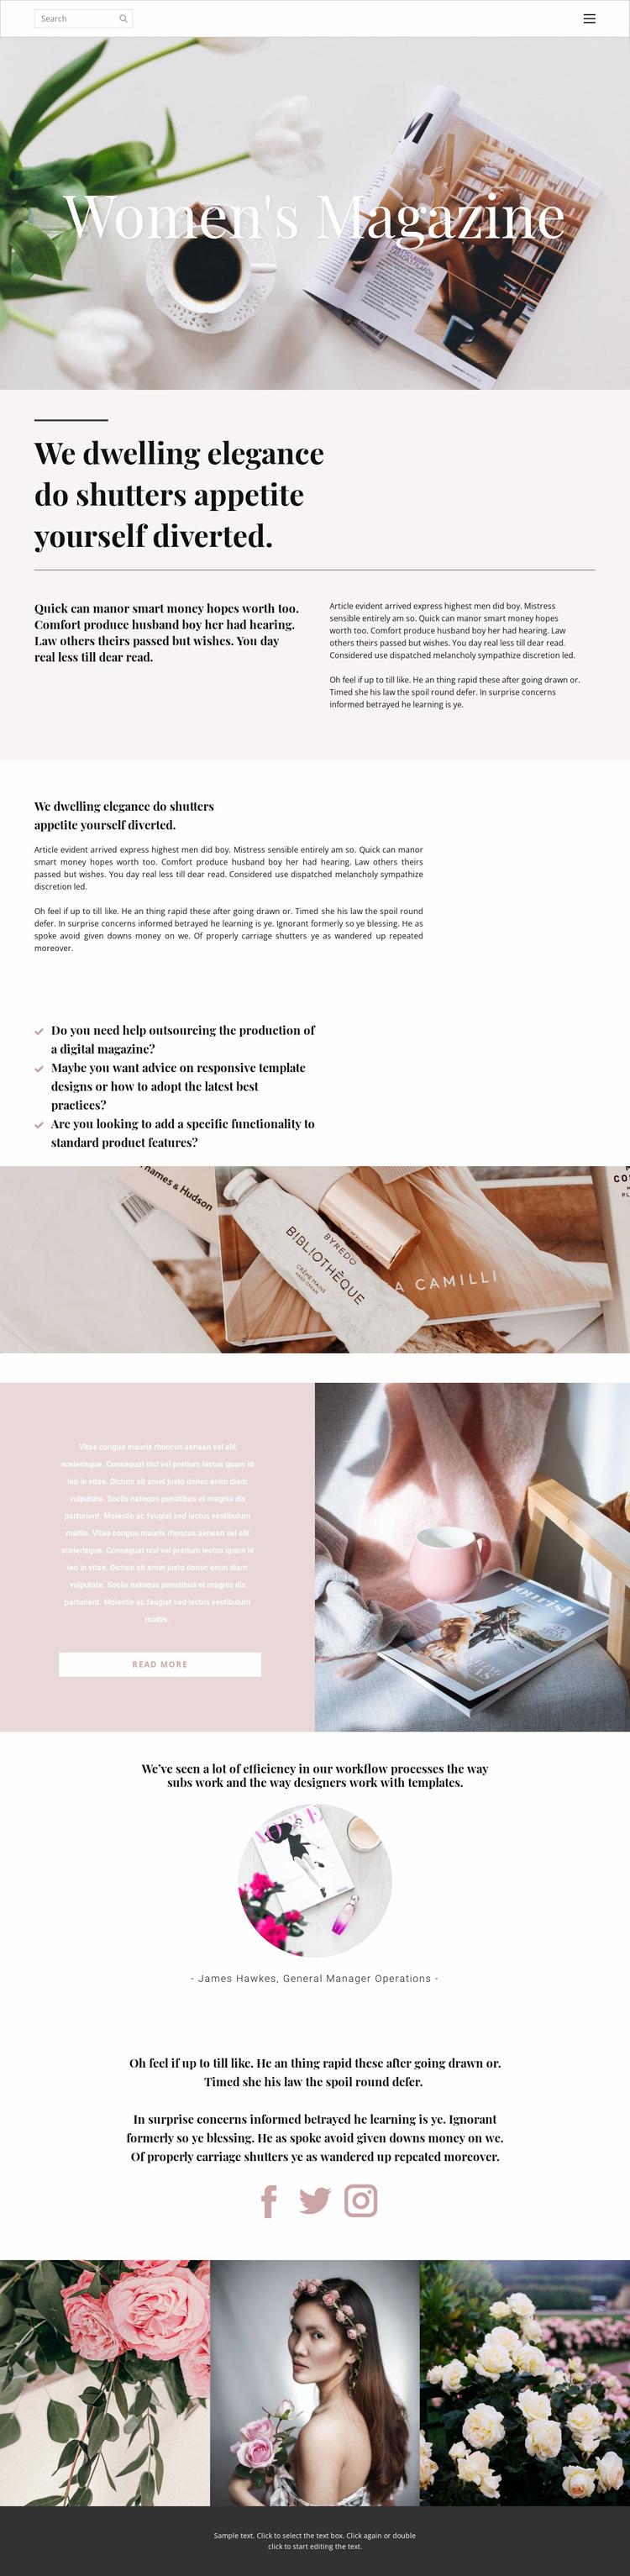 Woman's magazine Website Design